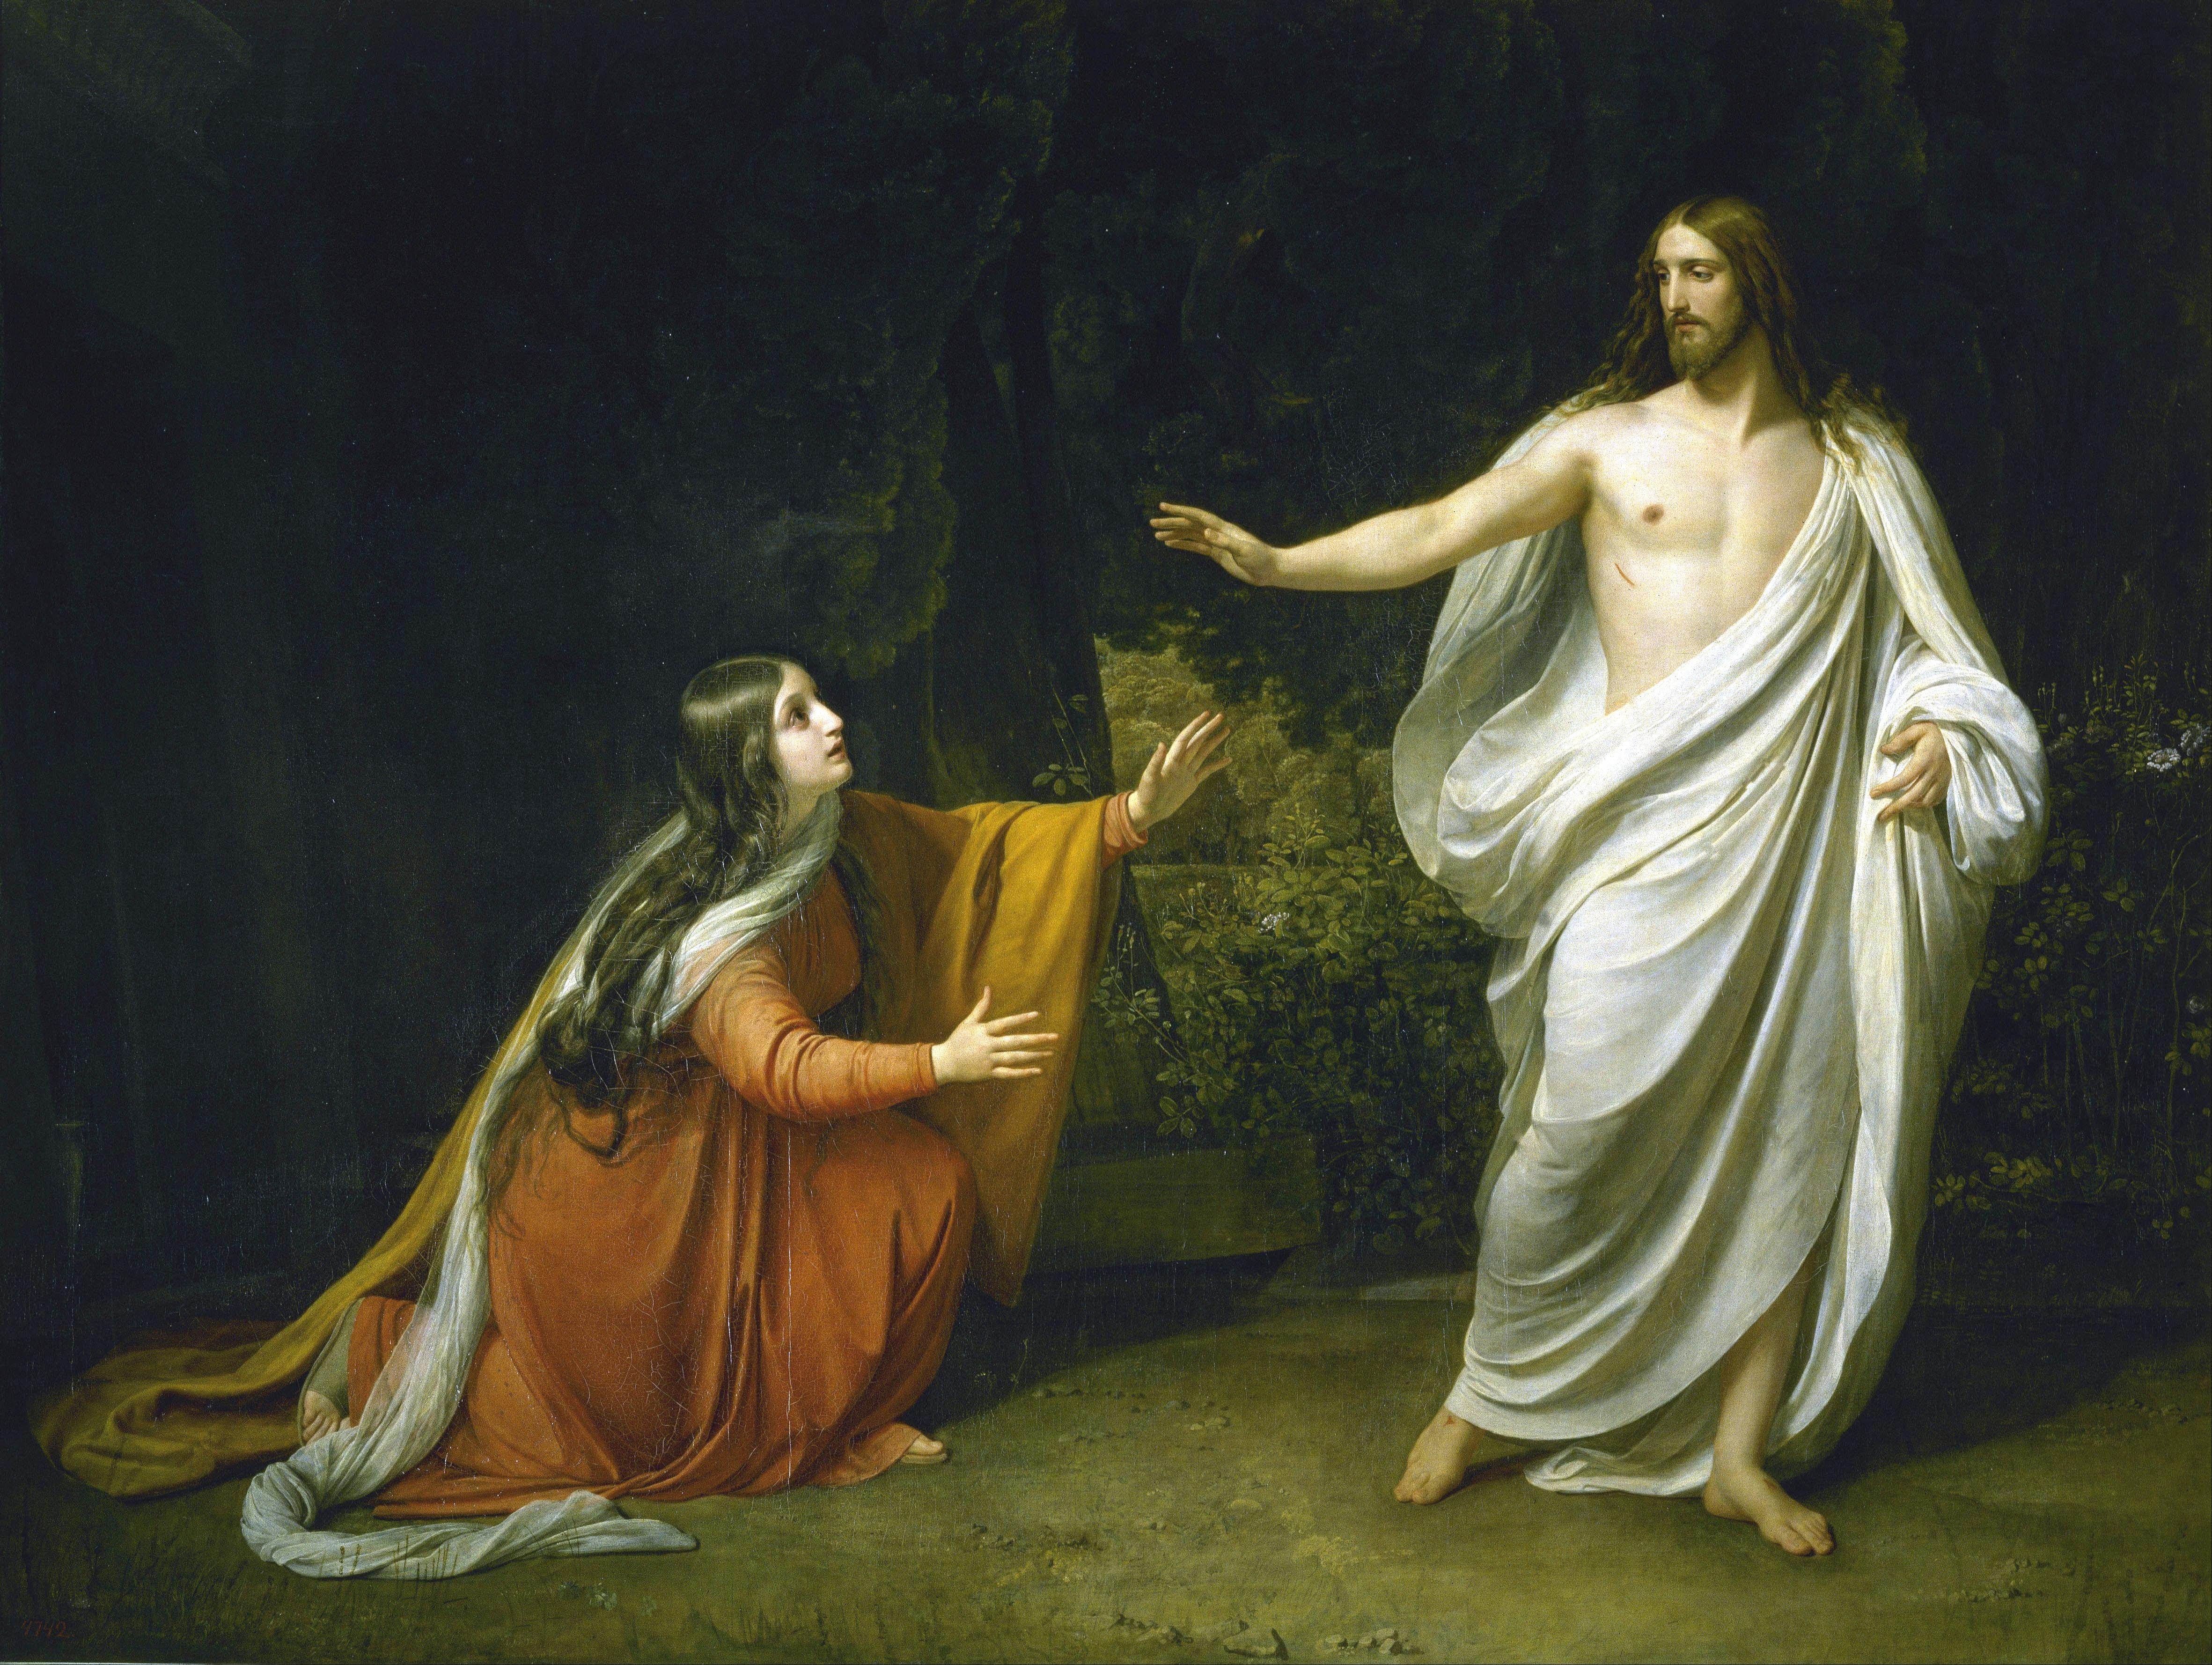 malina-gif-nudist-body-of-christ